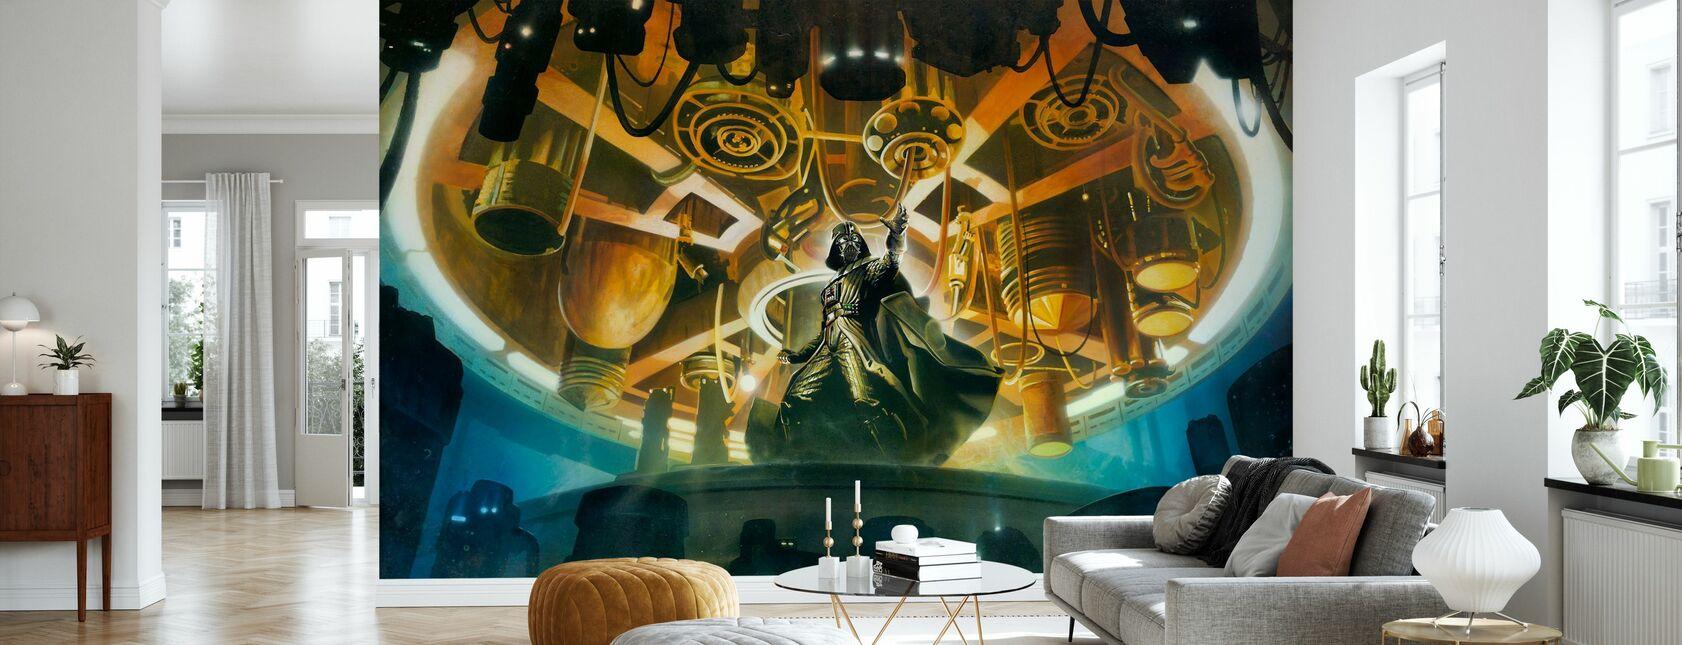 Darth Vader™ - Pilvi kaupunki™ - Tapetti - Olohuone